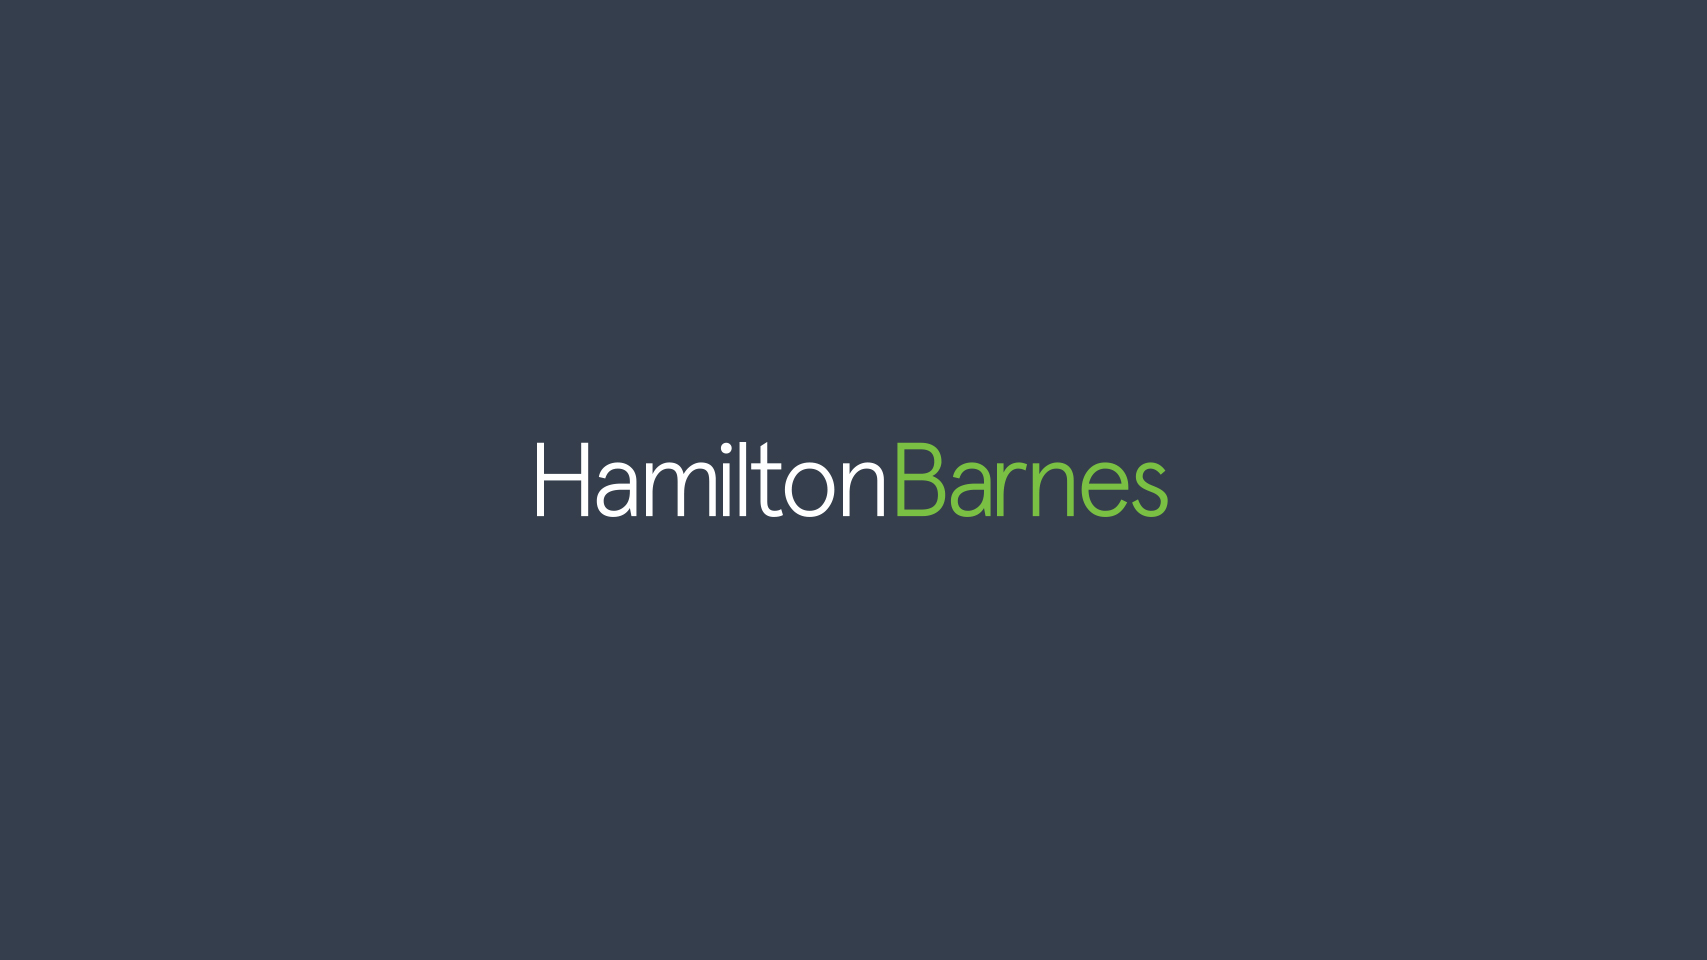 Hamilton Barnes